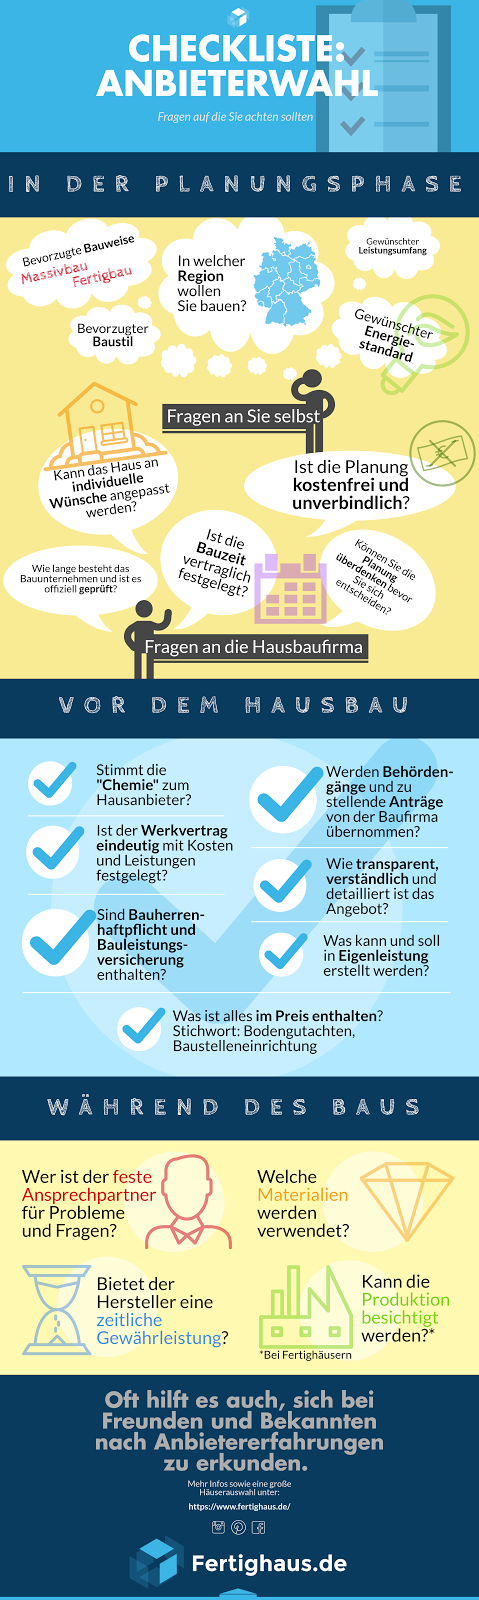 Checkliste-Anbieterwahl-Infografik.png